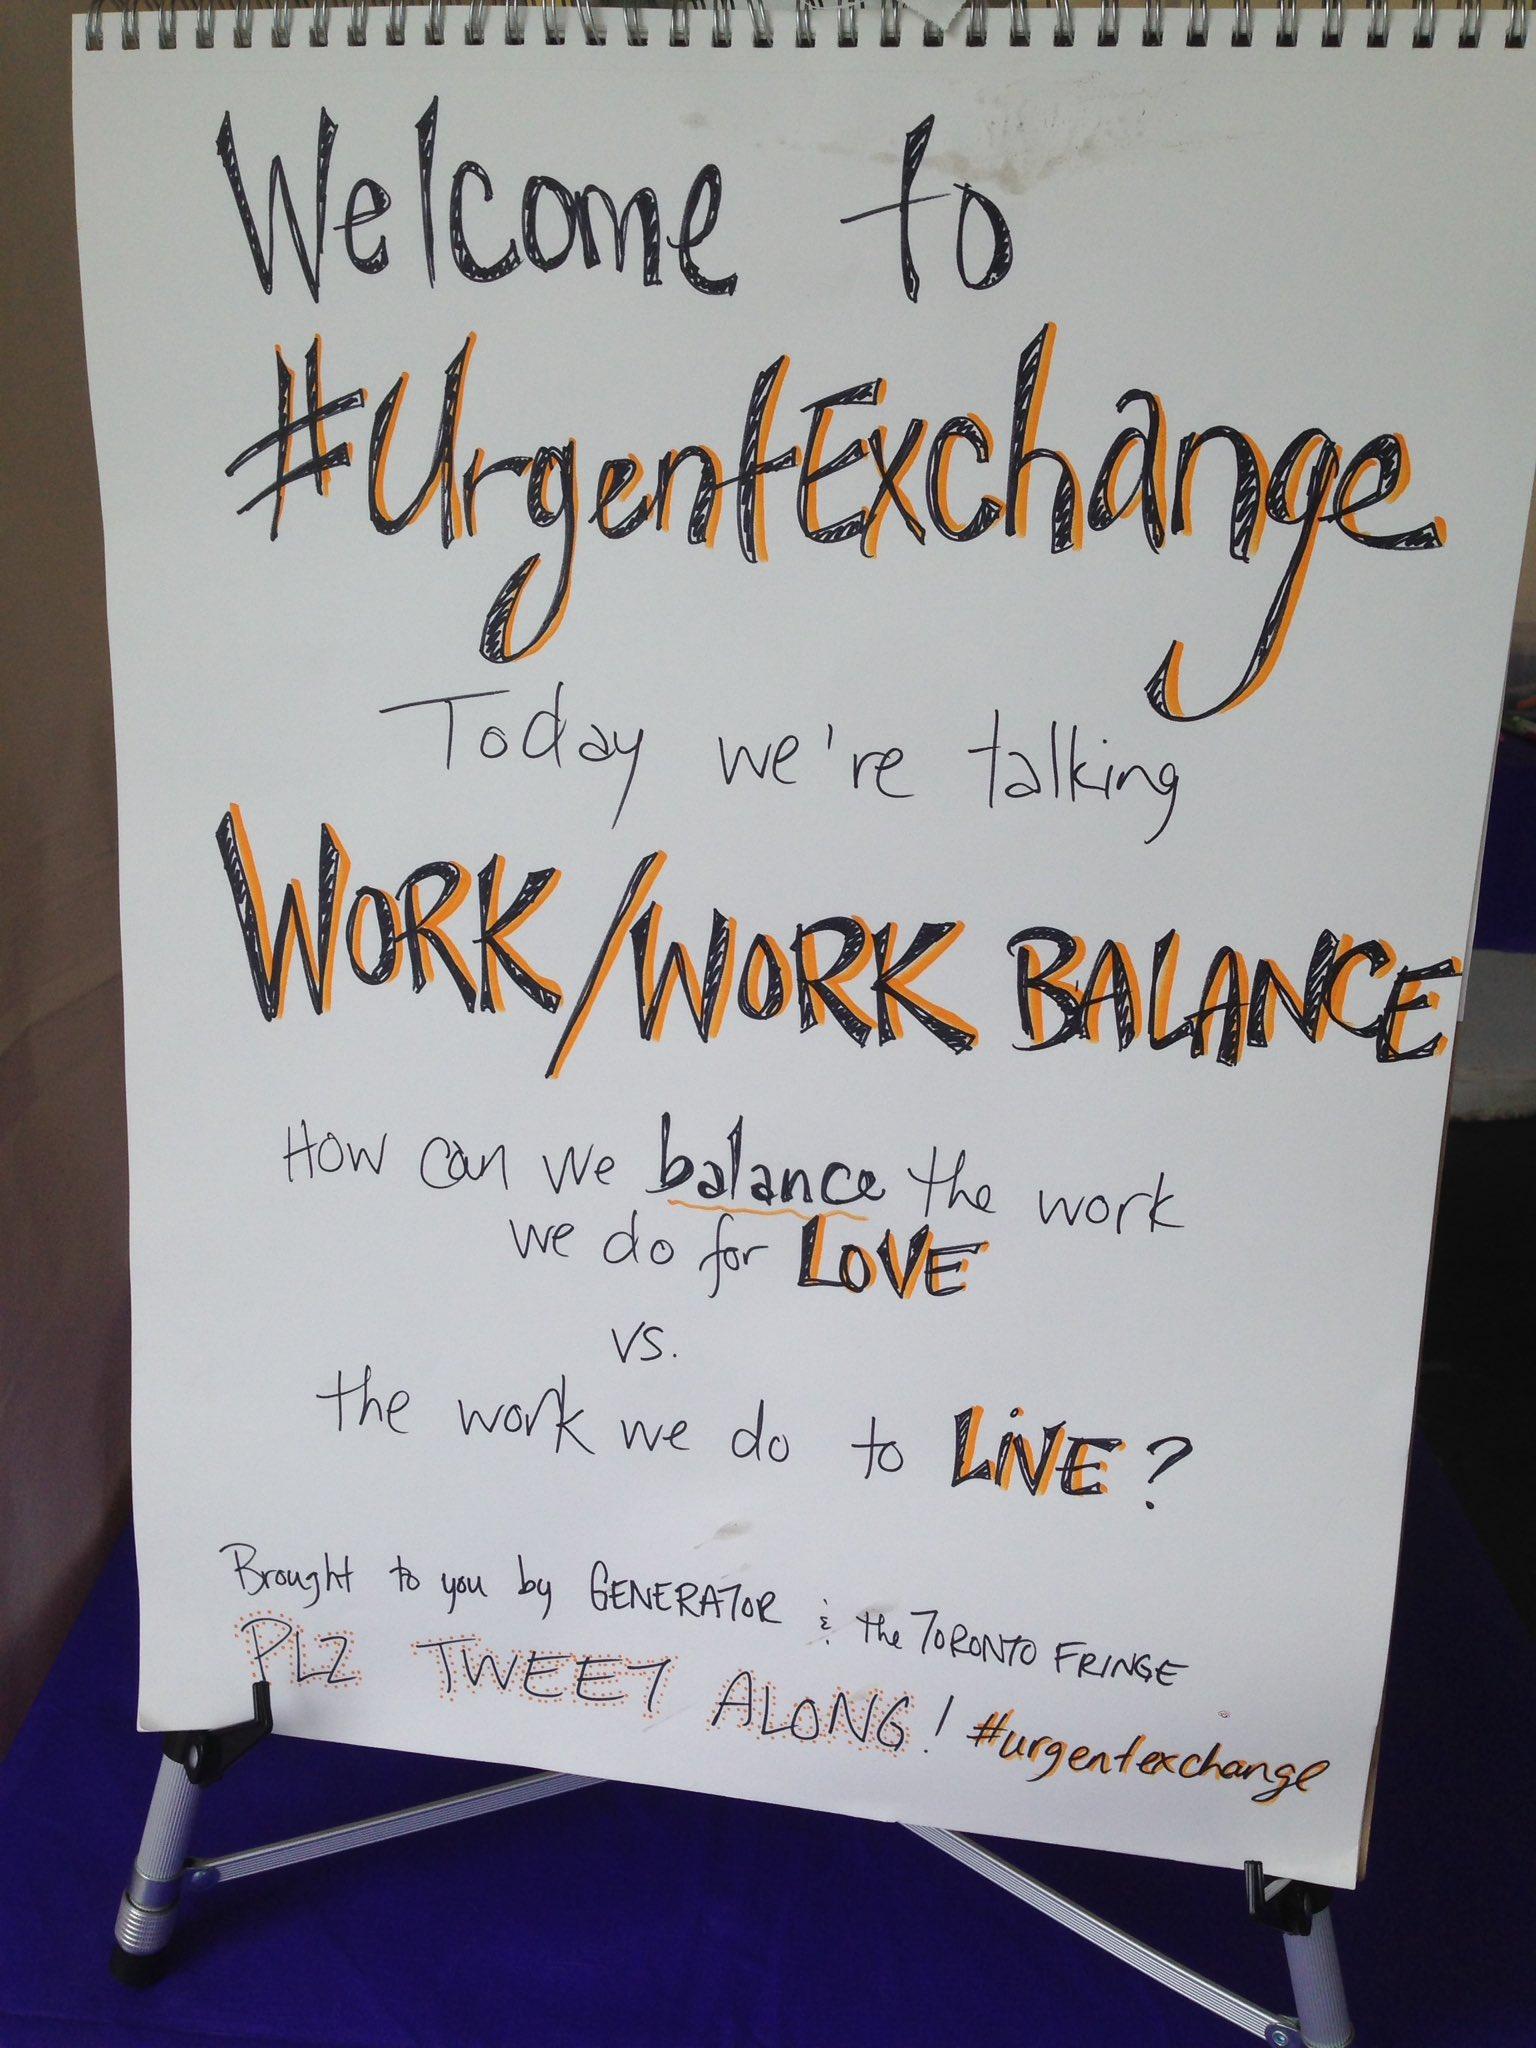 Getting started w today's WORK/WORK BALANCE #urgentexchange @Toronto_Fringe #fringeto https://t.co/B4KArprtJ6